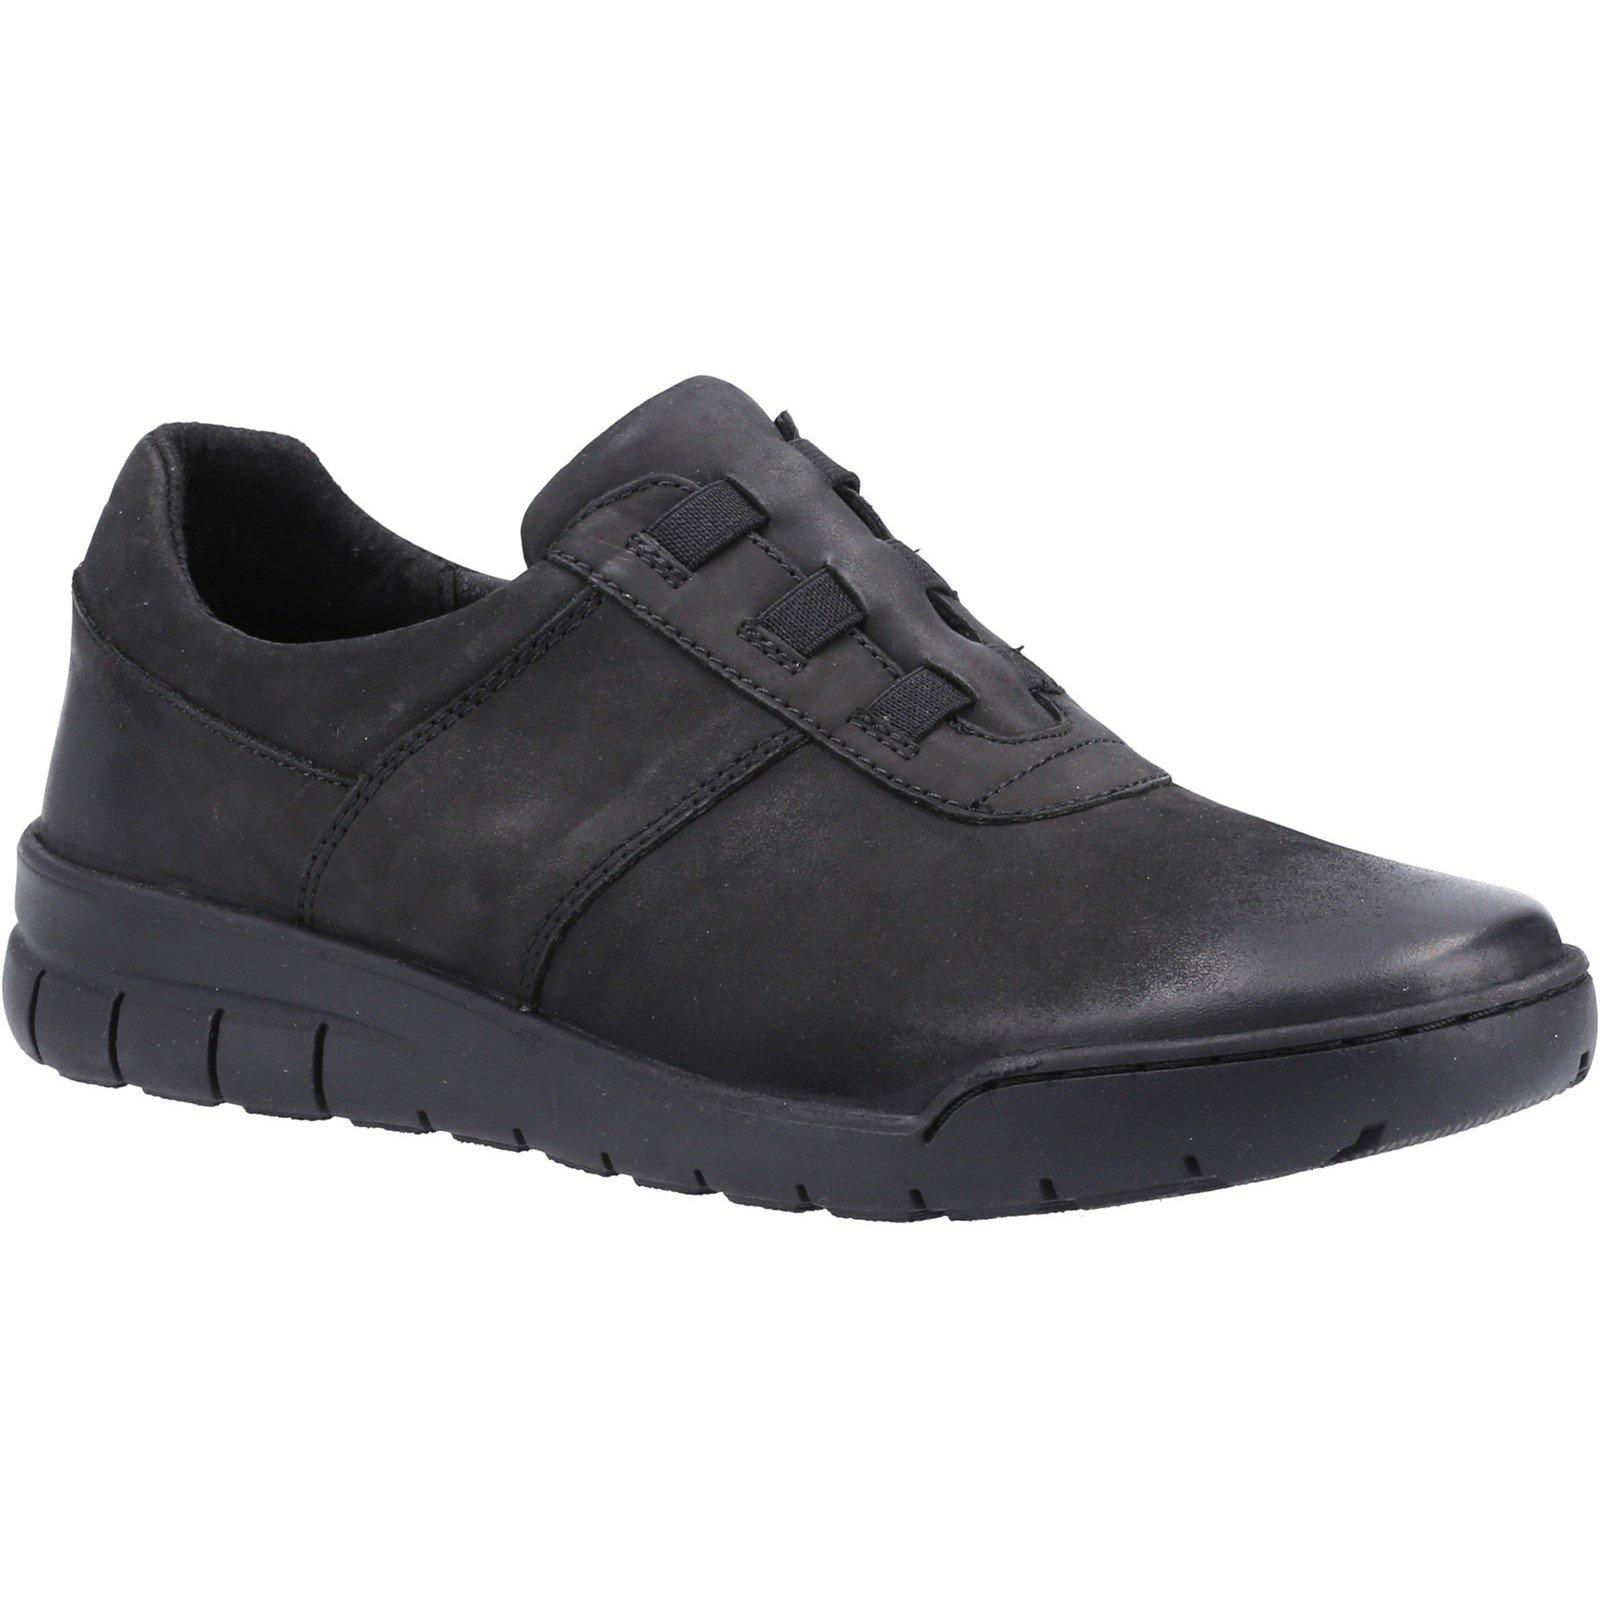 Fleet & Foster Women's Cristianos Slip On Shoe Various Colours 33015 - Black 3